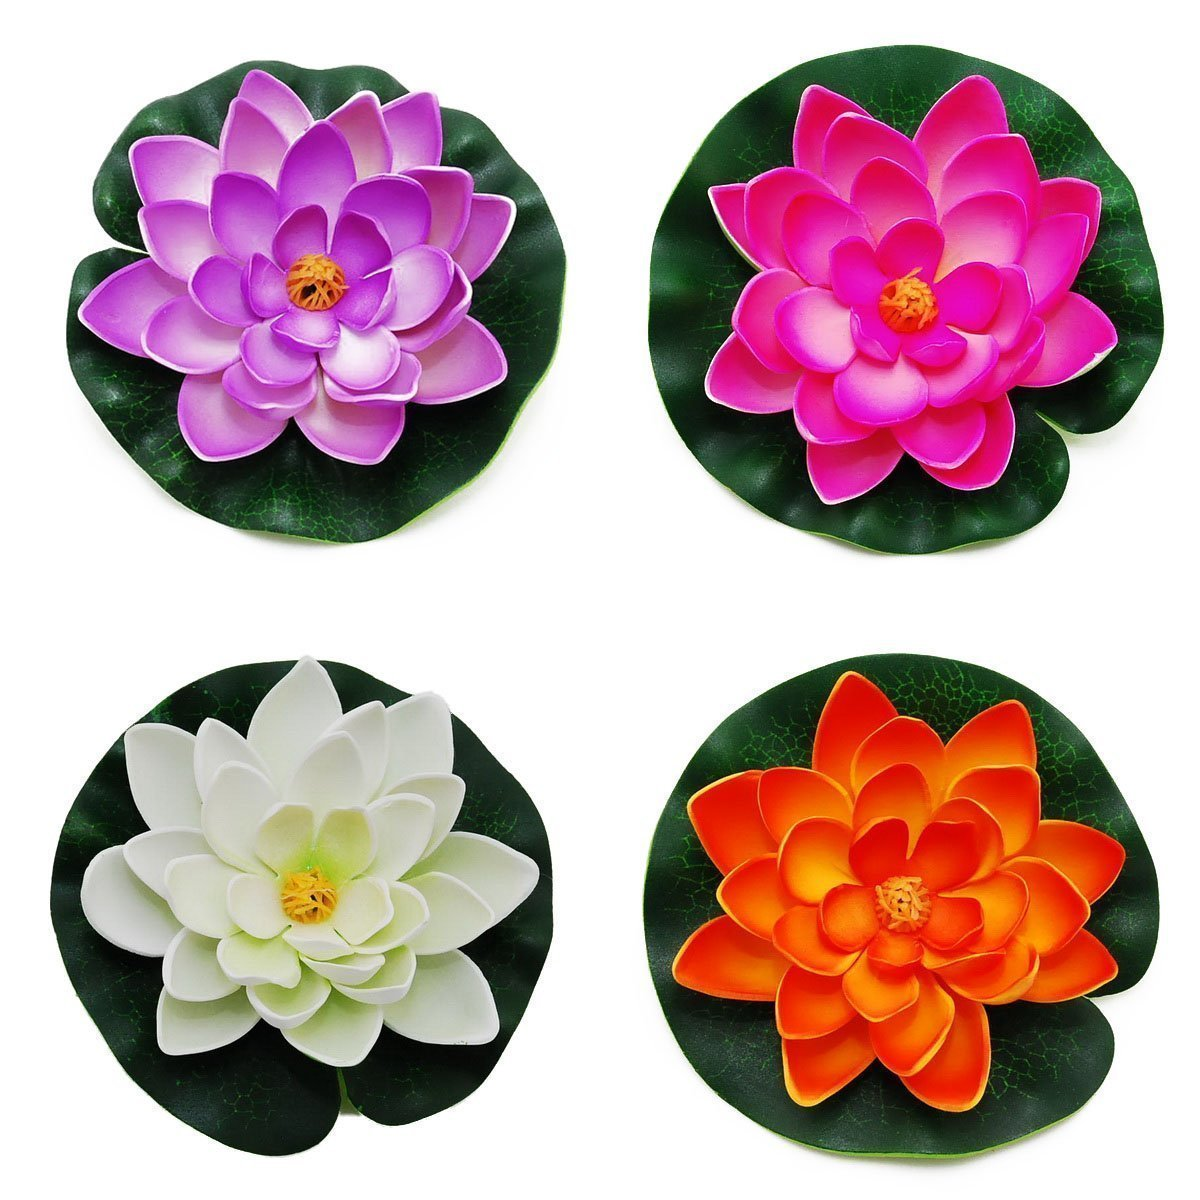 NiceButy Floating Pond Decor Water Lily/Lotus Foam Flower, Large (Set of 4)